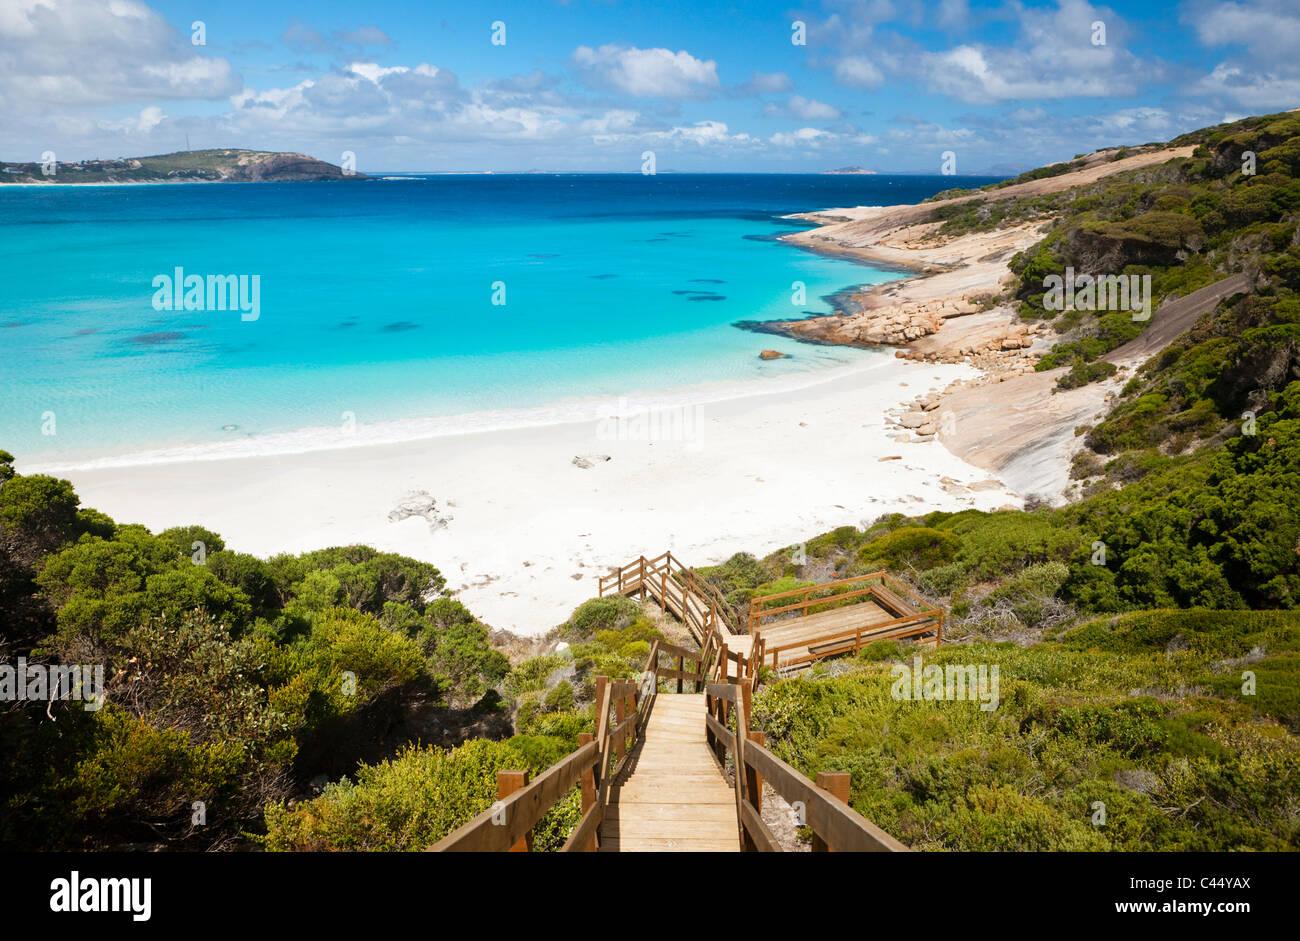 Boardwalk leading down to Blue Haven Beach. Esperance, Western Australia, Australia - Stock Image